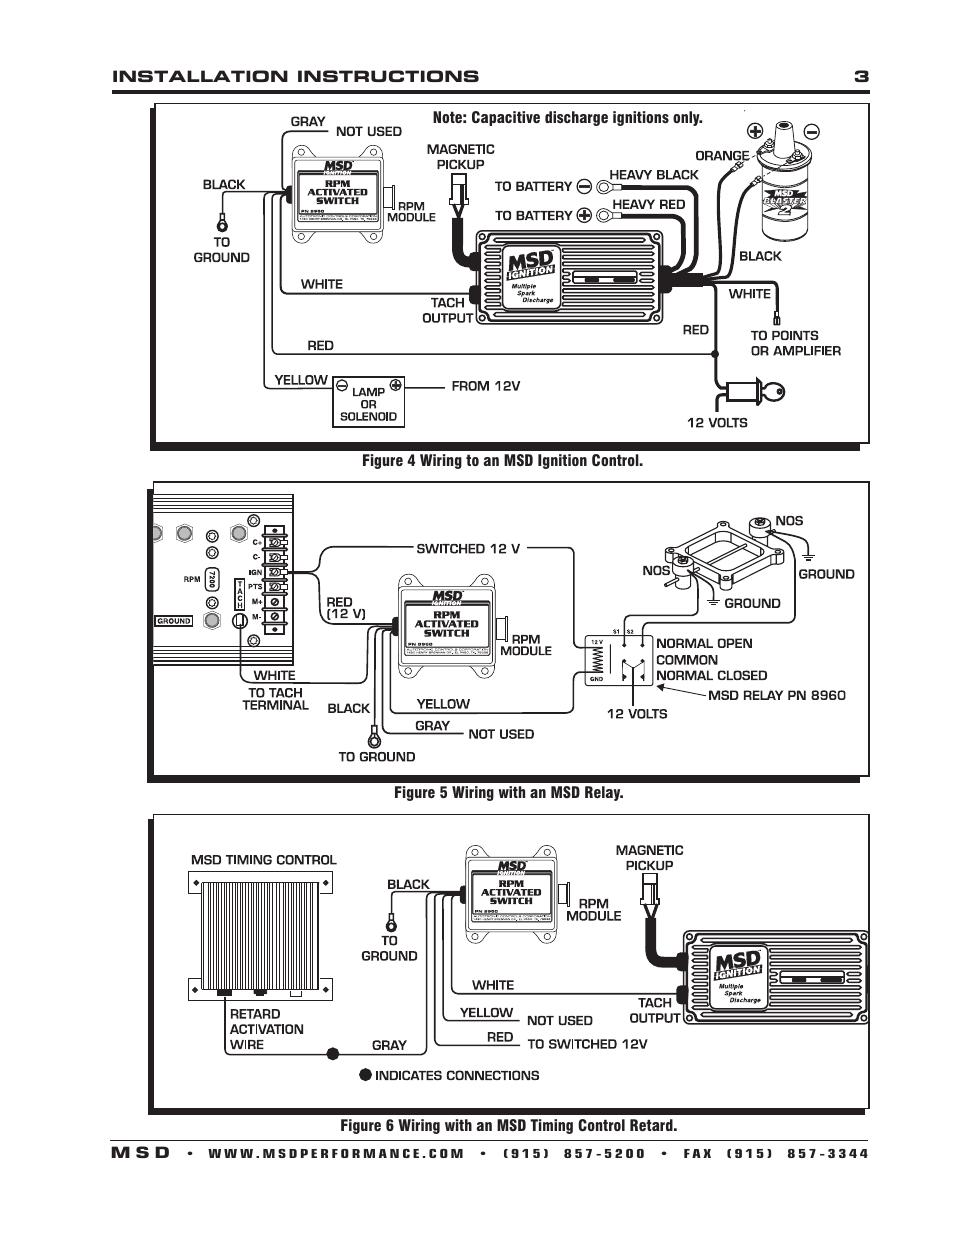 4cyl Ford Tfi Msd 6al Wiring Diagram FULL HD Version Wiring Diagram - WIRING -DIAGRAM.GALVANIRE.ITgalvanire.it